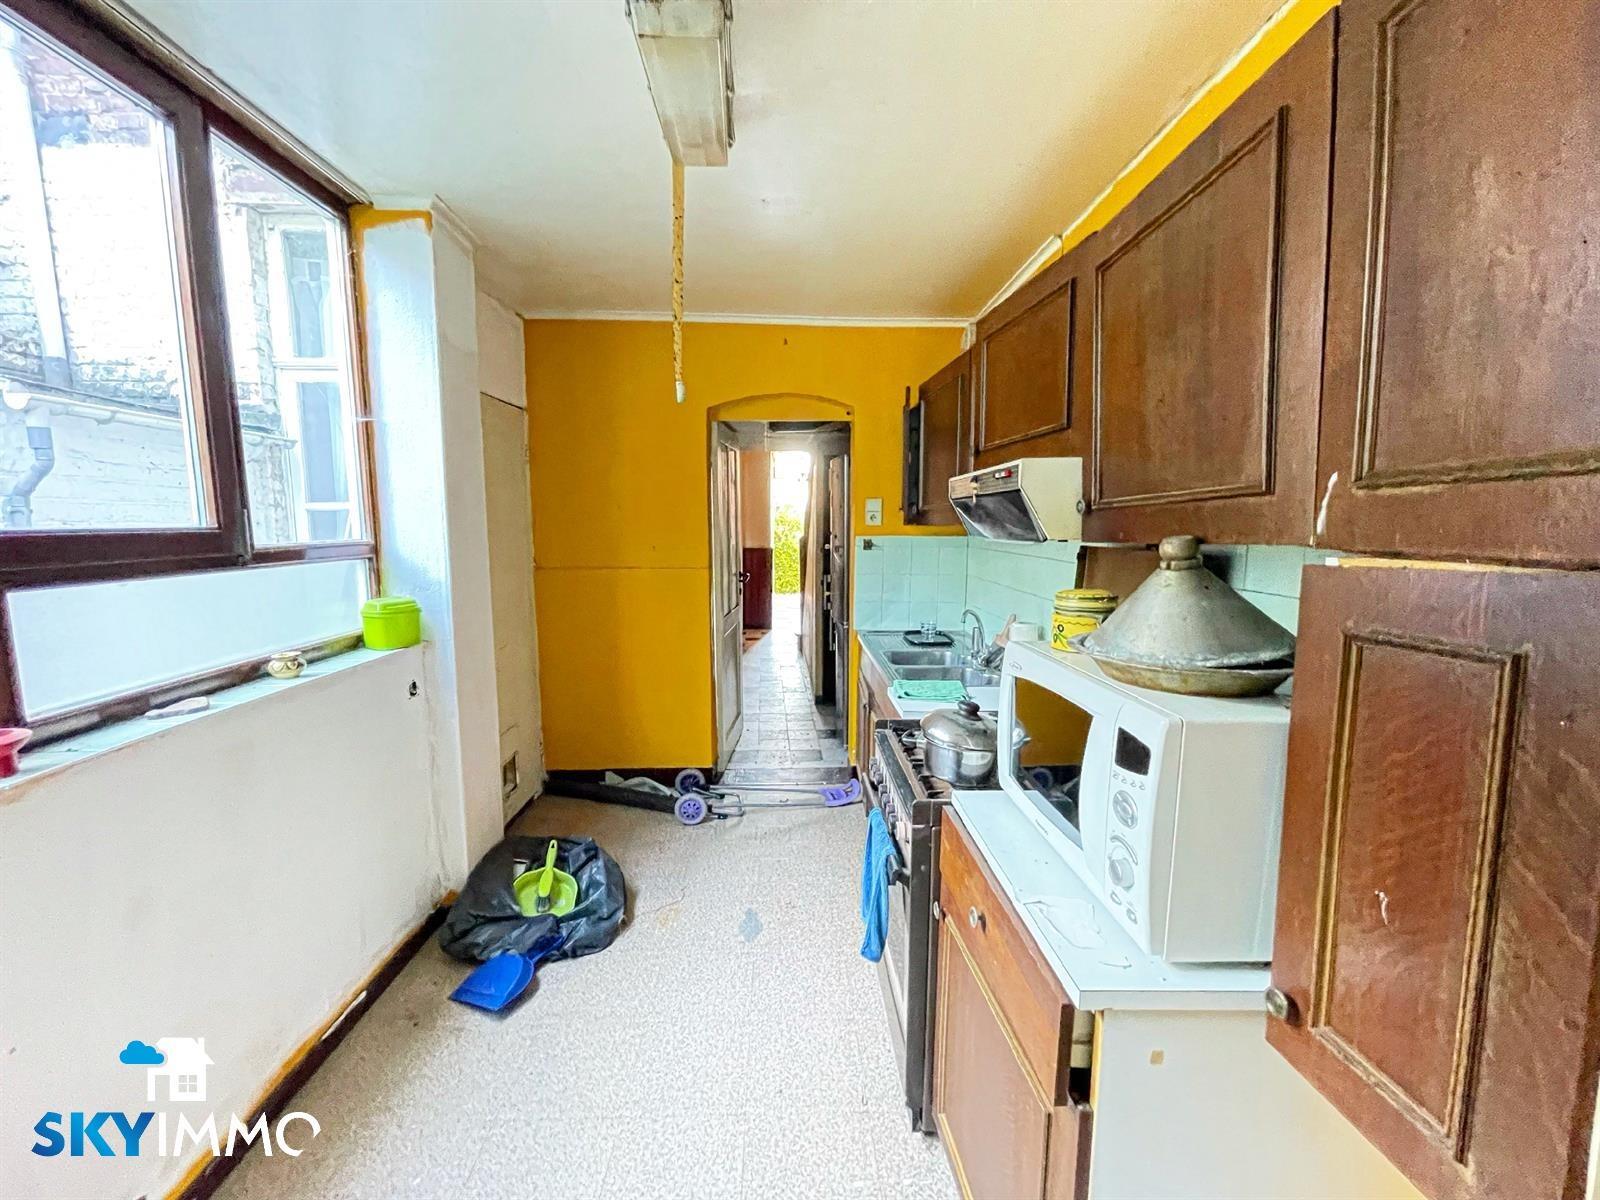 Maison - Seraing Jemeppesur-Meuse - #4383857-8